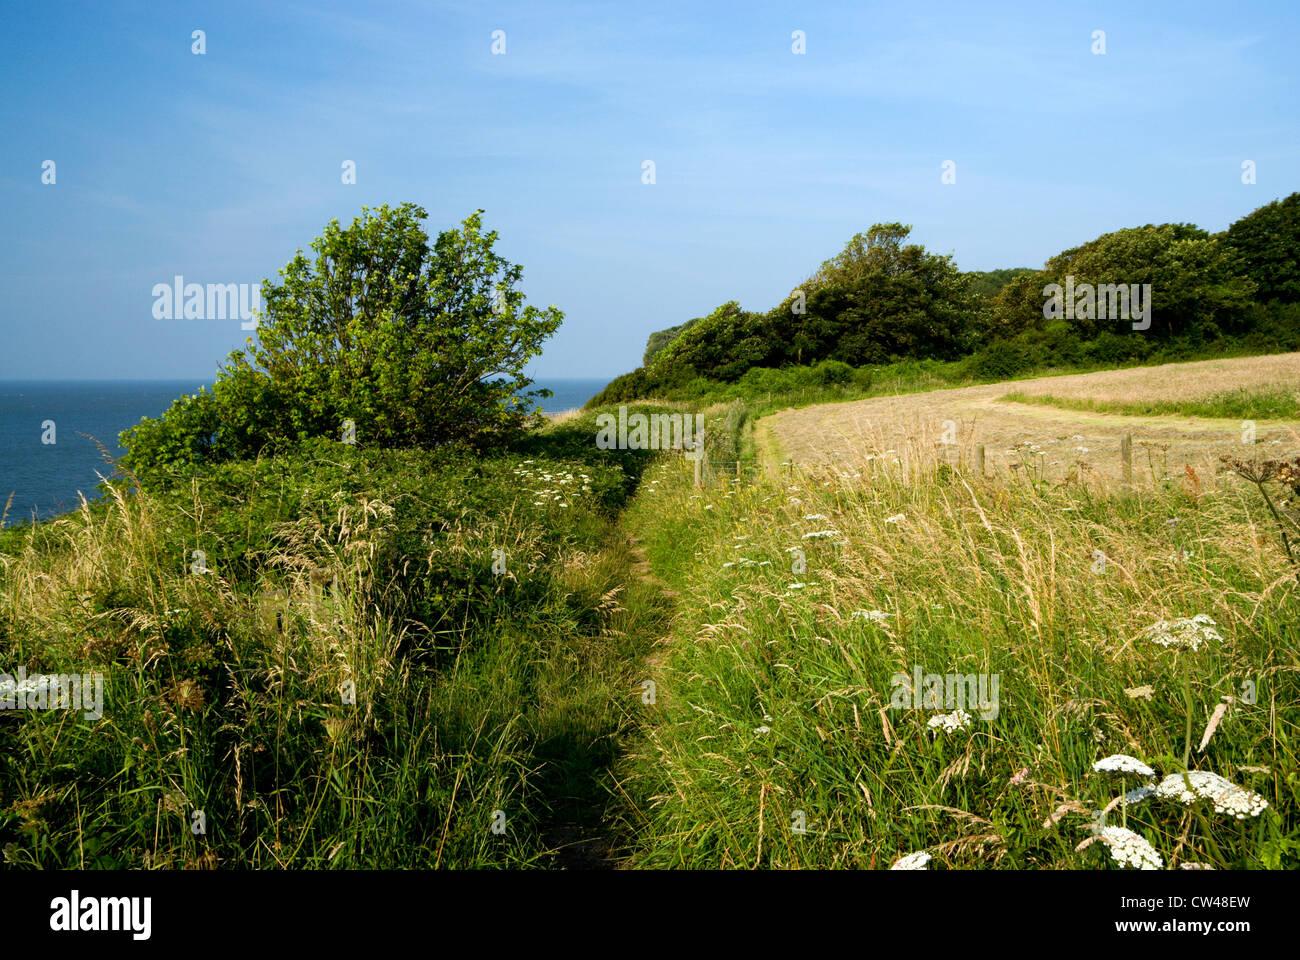 all wales coastal path, st donats, llantwit major, glamorgan heritage coast, vale of glamorgan, wales. - Stock Image